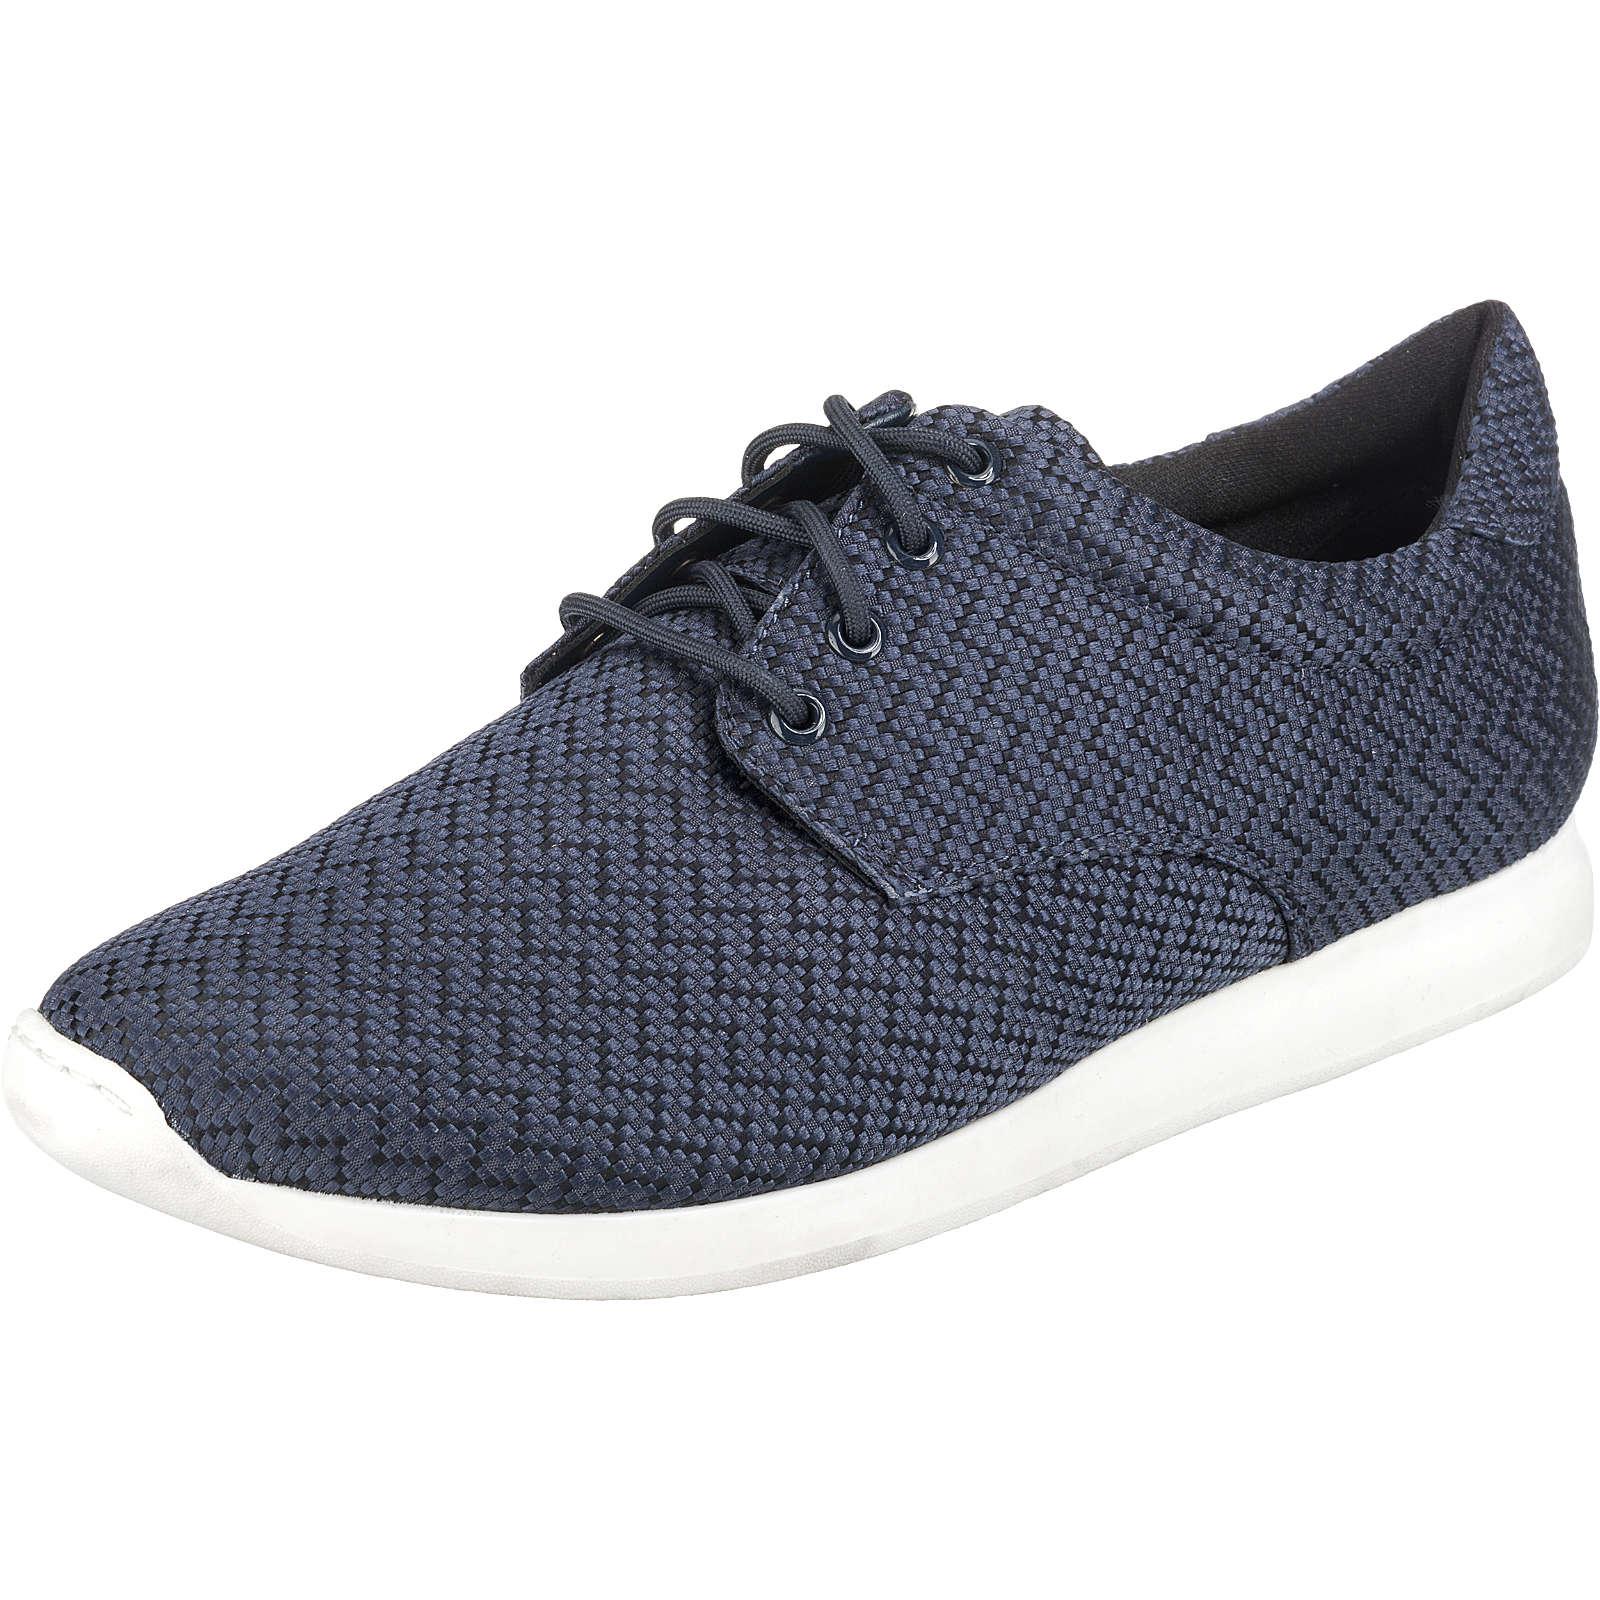 VAGABOND Kasai 2.0 Sneakers Low dunkelblau Damen Gr. 36